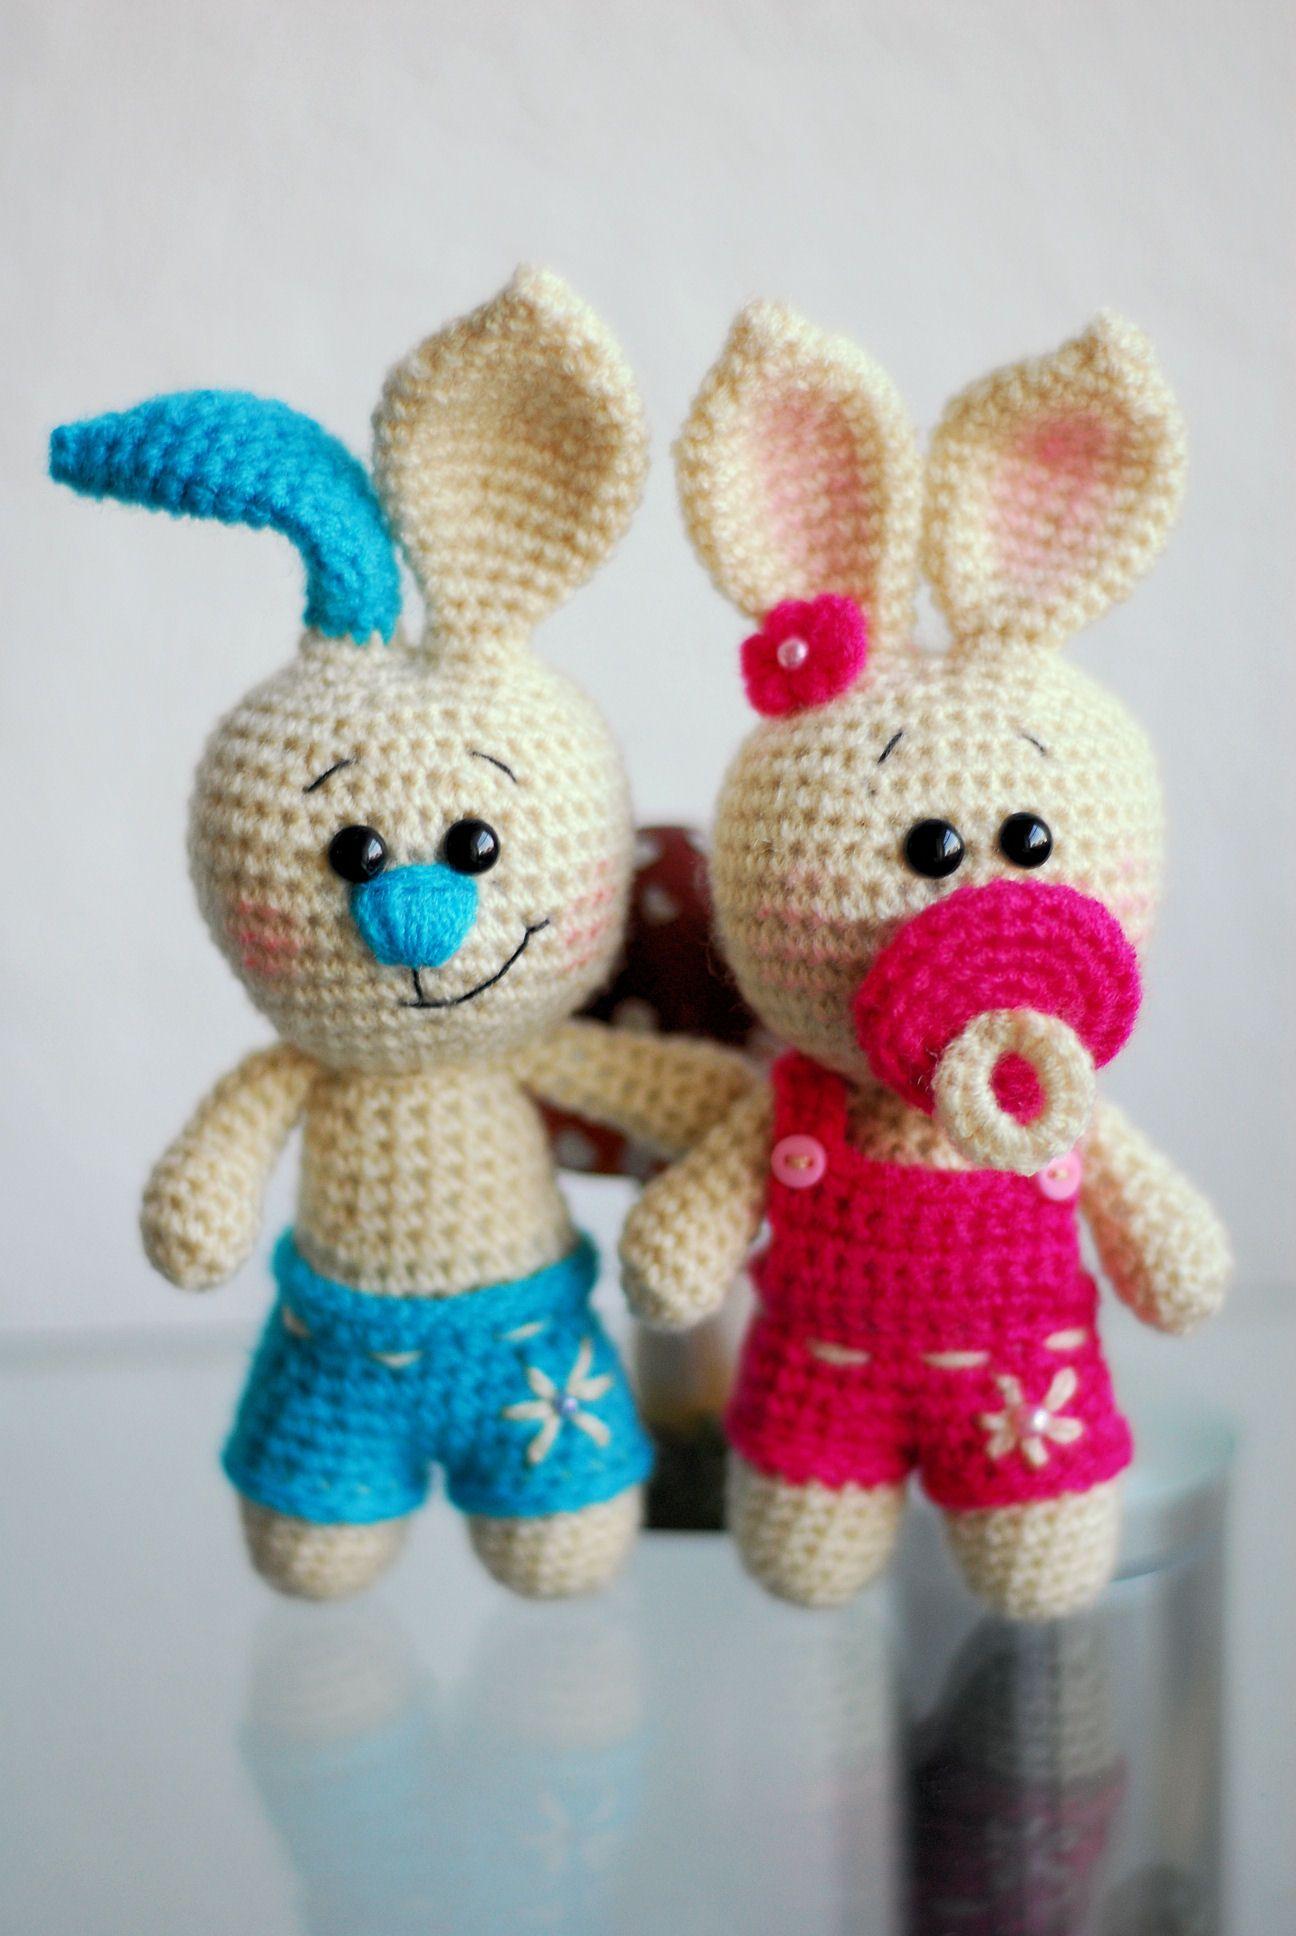 Hasen - Jzamell Teddy\'s & Co. | Jzamell Teddy\'s & Co. | Pinterest ...